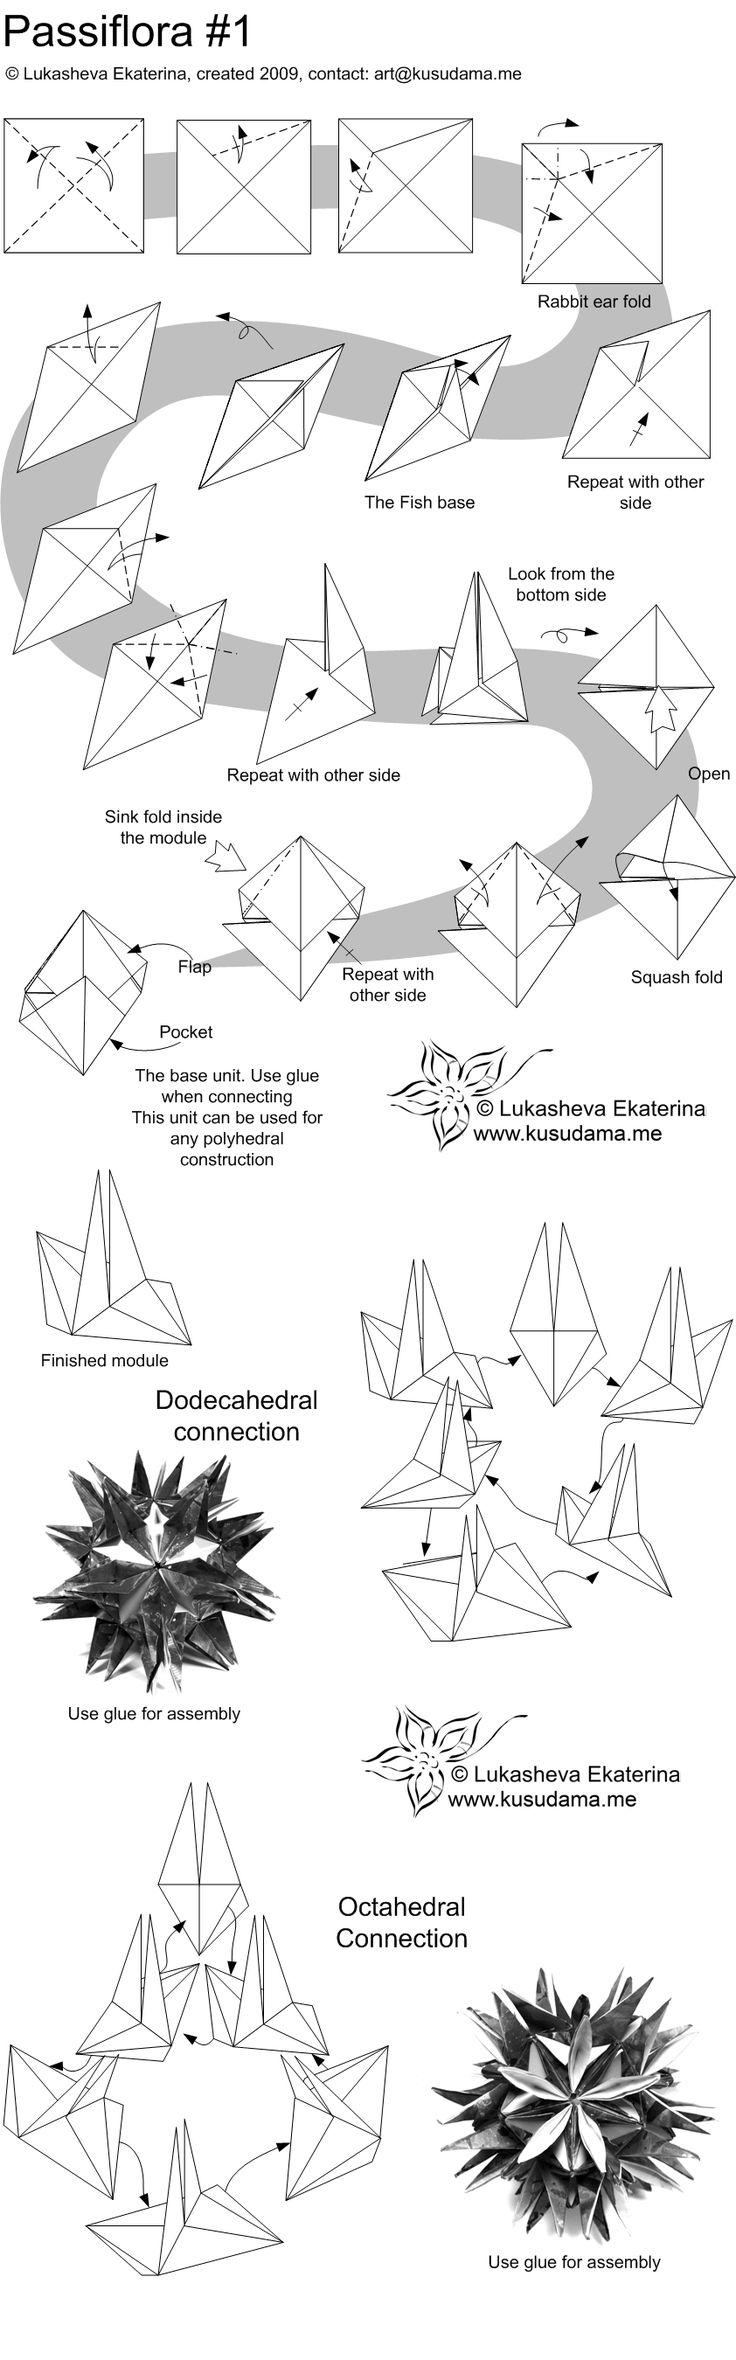 Diagram for Pentaculus kusudama  Variação: http://www.kusudama.me/#/Passiflora/Passiflora-curly